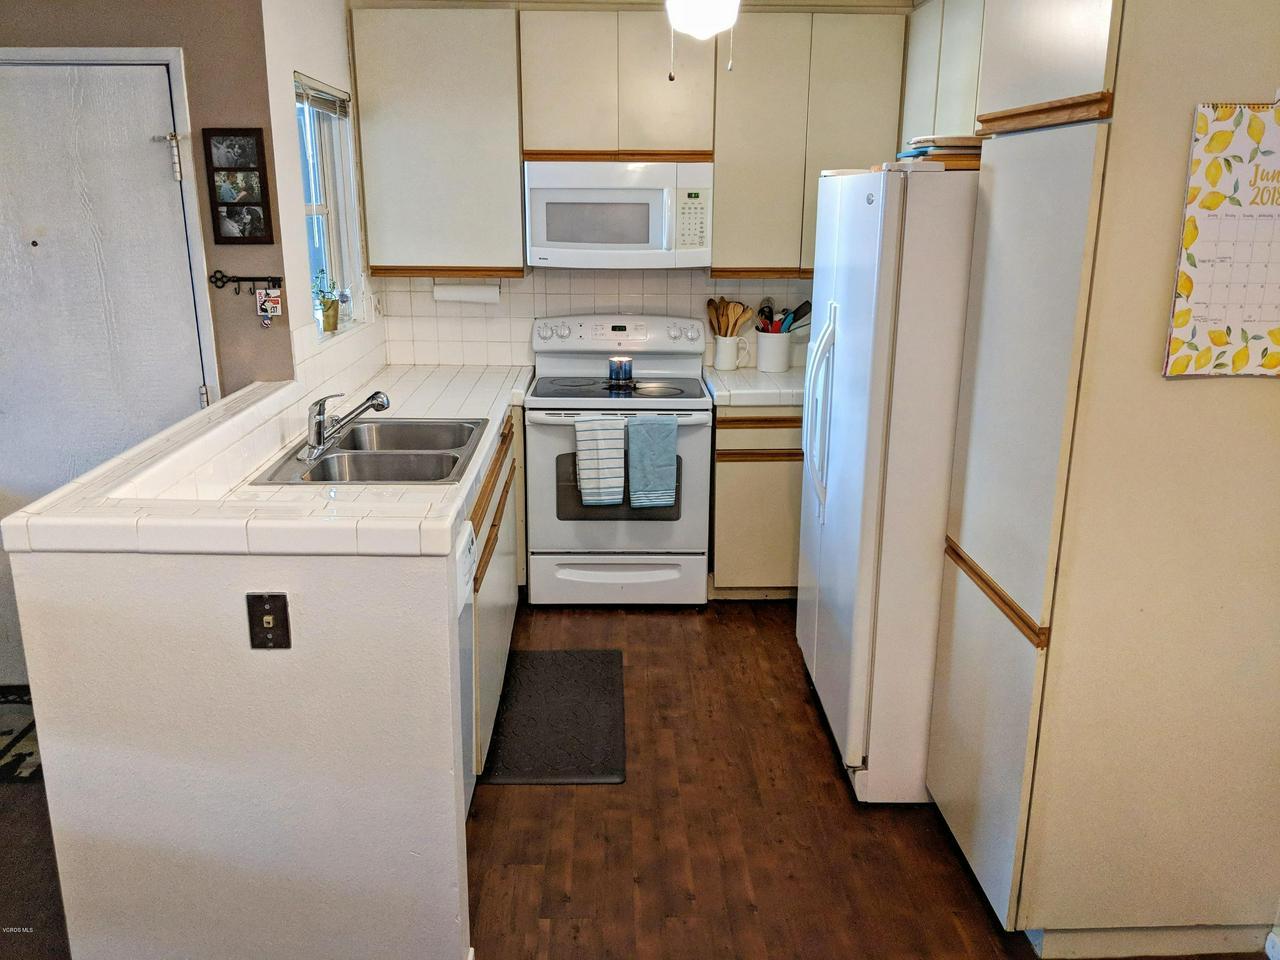 27646 SUSAN BETH, Saugus, CA 91350 - IMG_20180618_181821-01 (1)